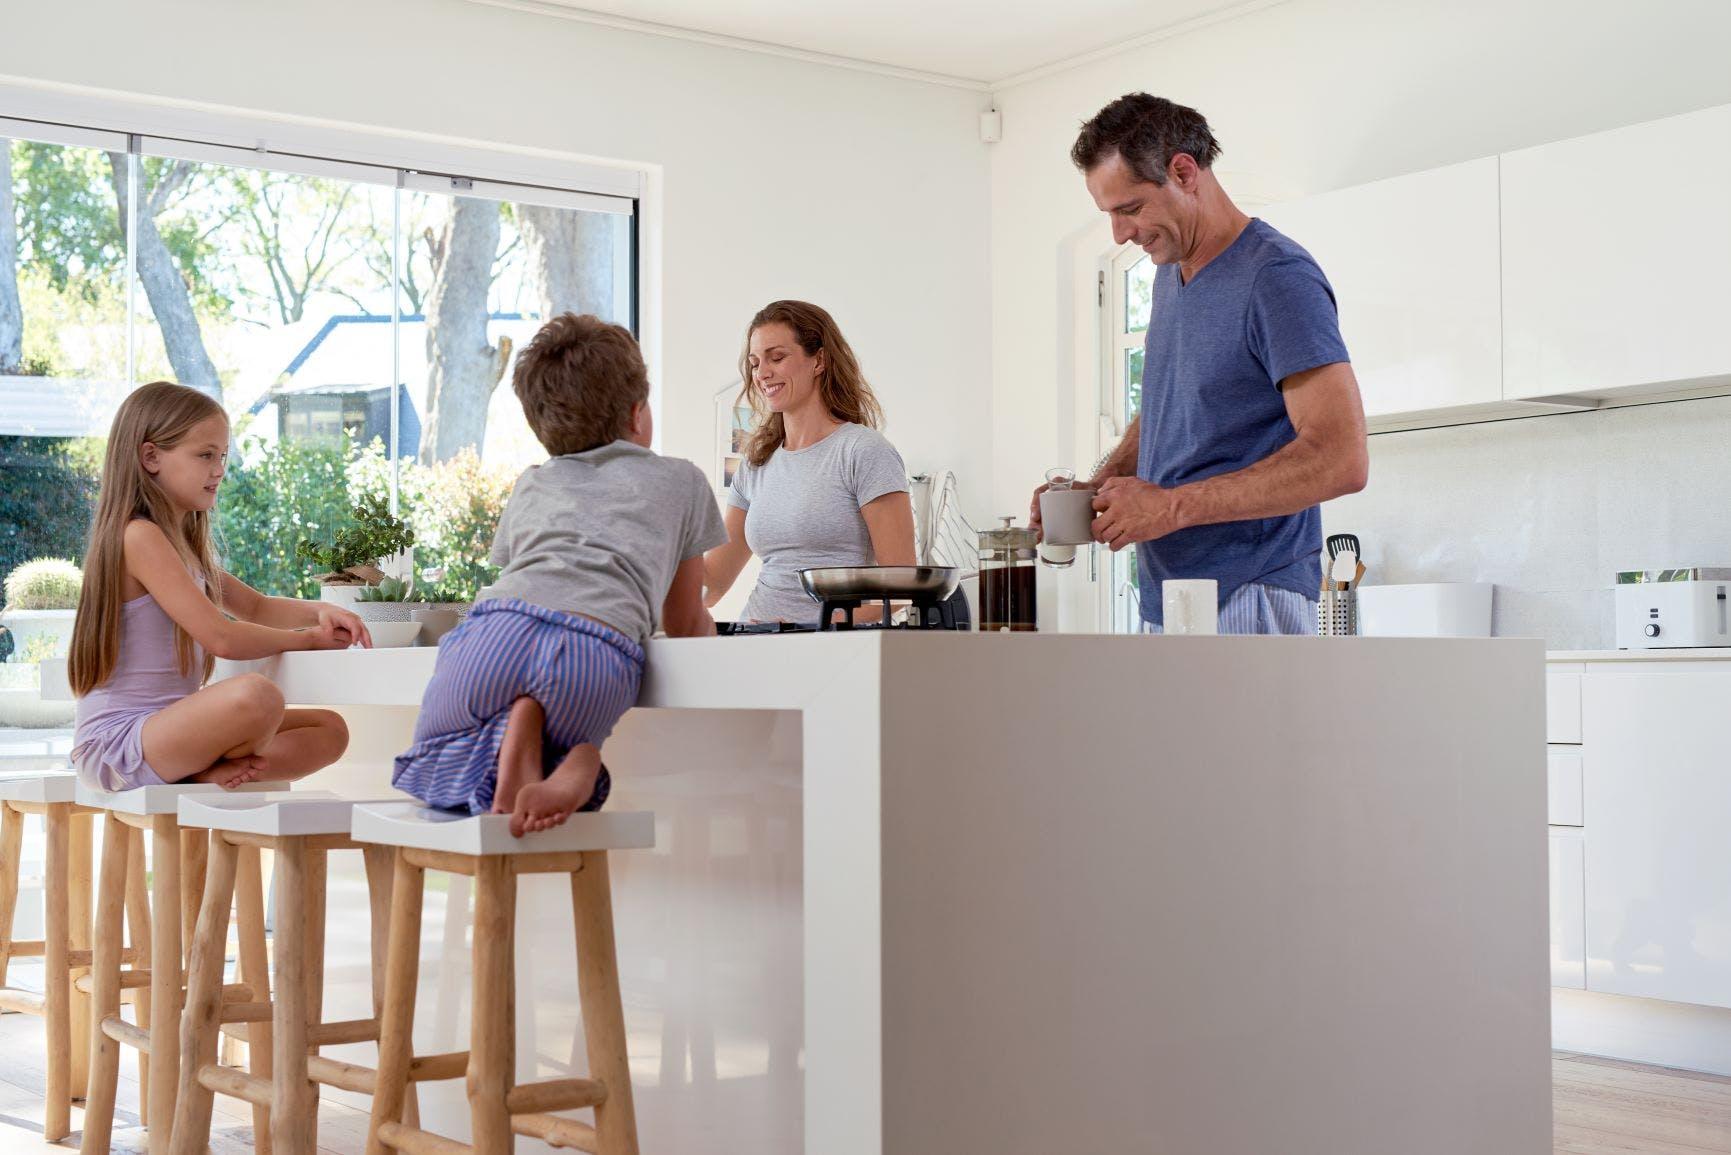 Image of Espacio para cuidar de la salud 4 in Global Kitchen: the kitchen, the heart of the home - Cosentino